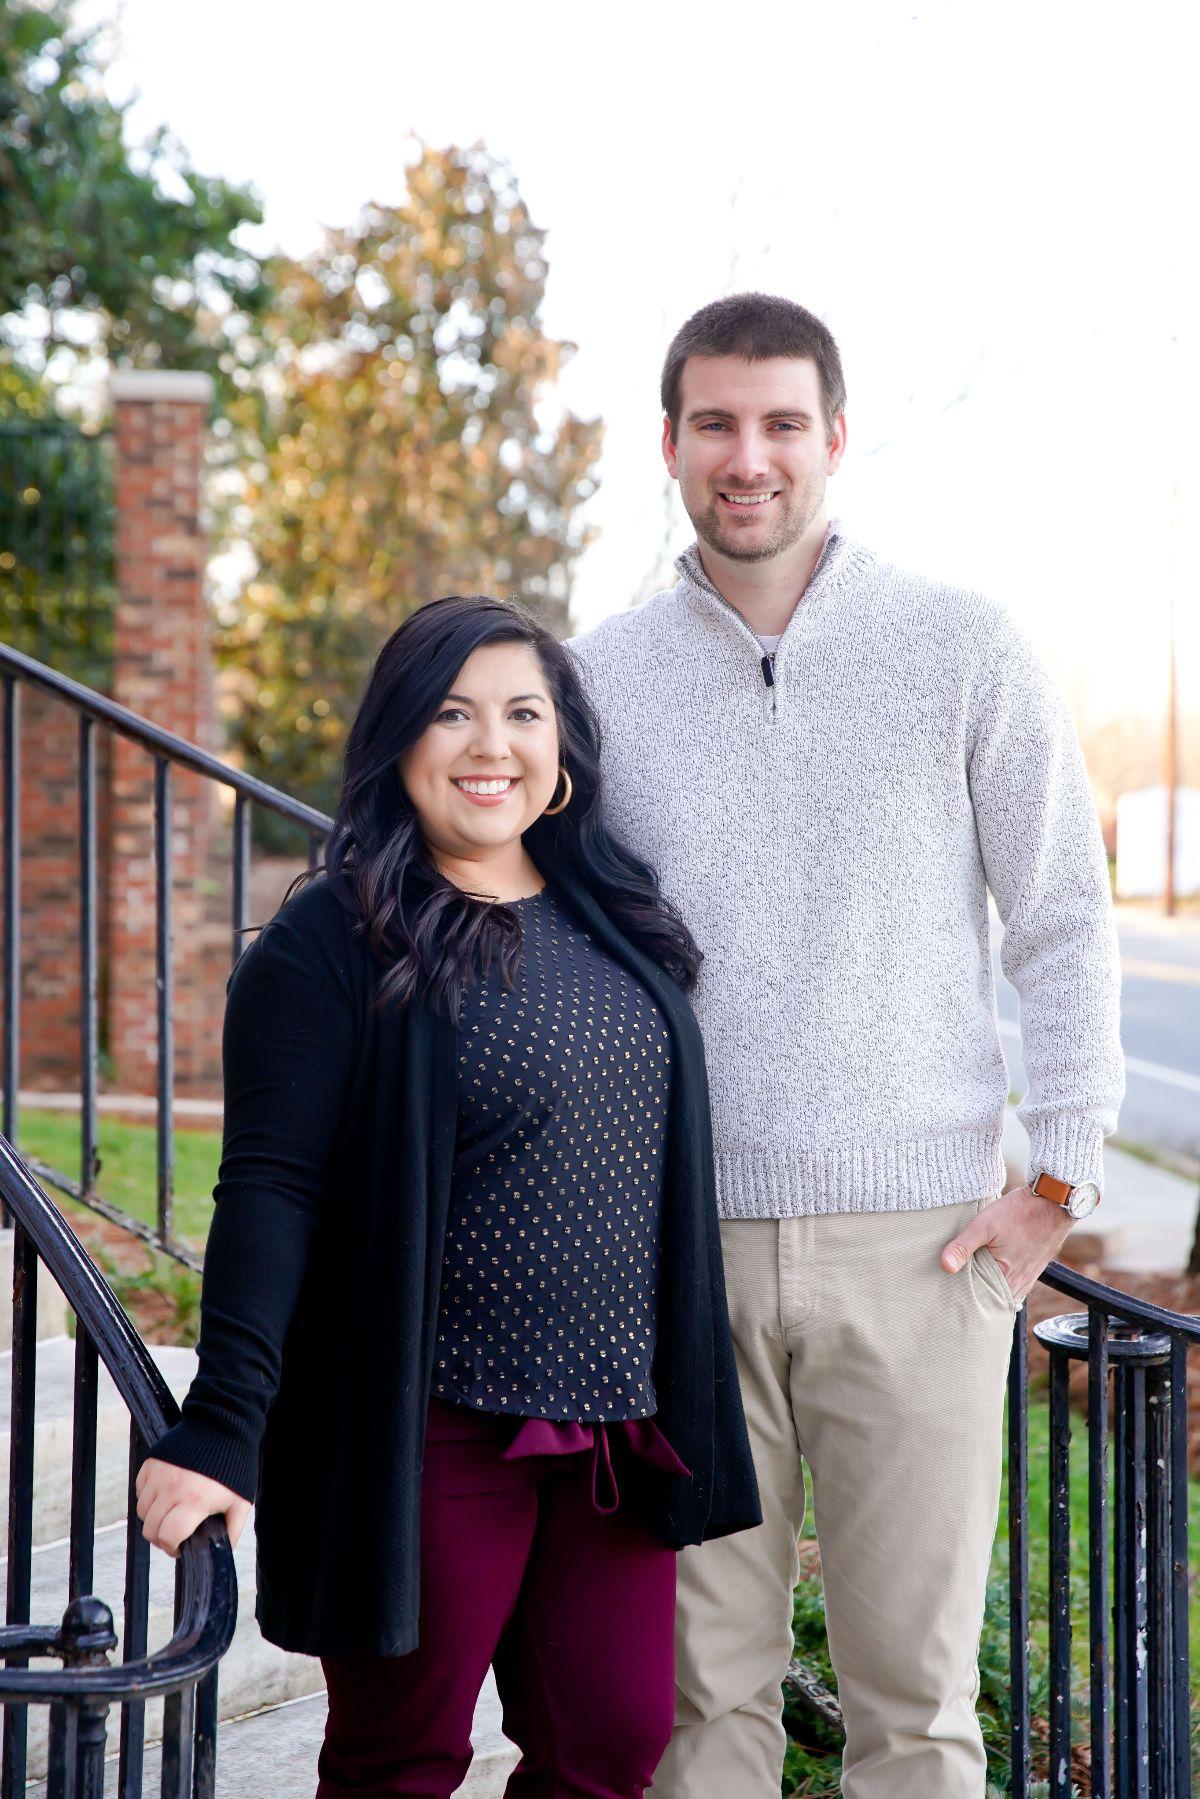 Dr Pressley and her husband